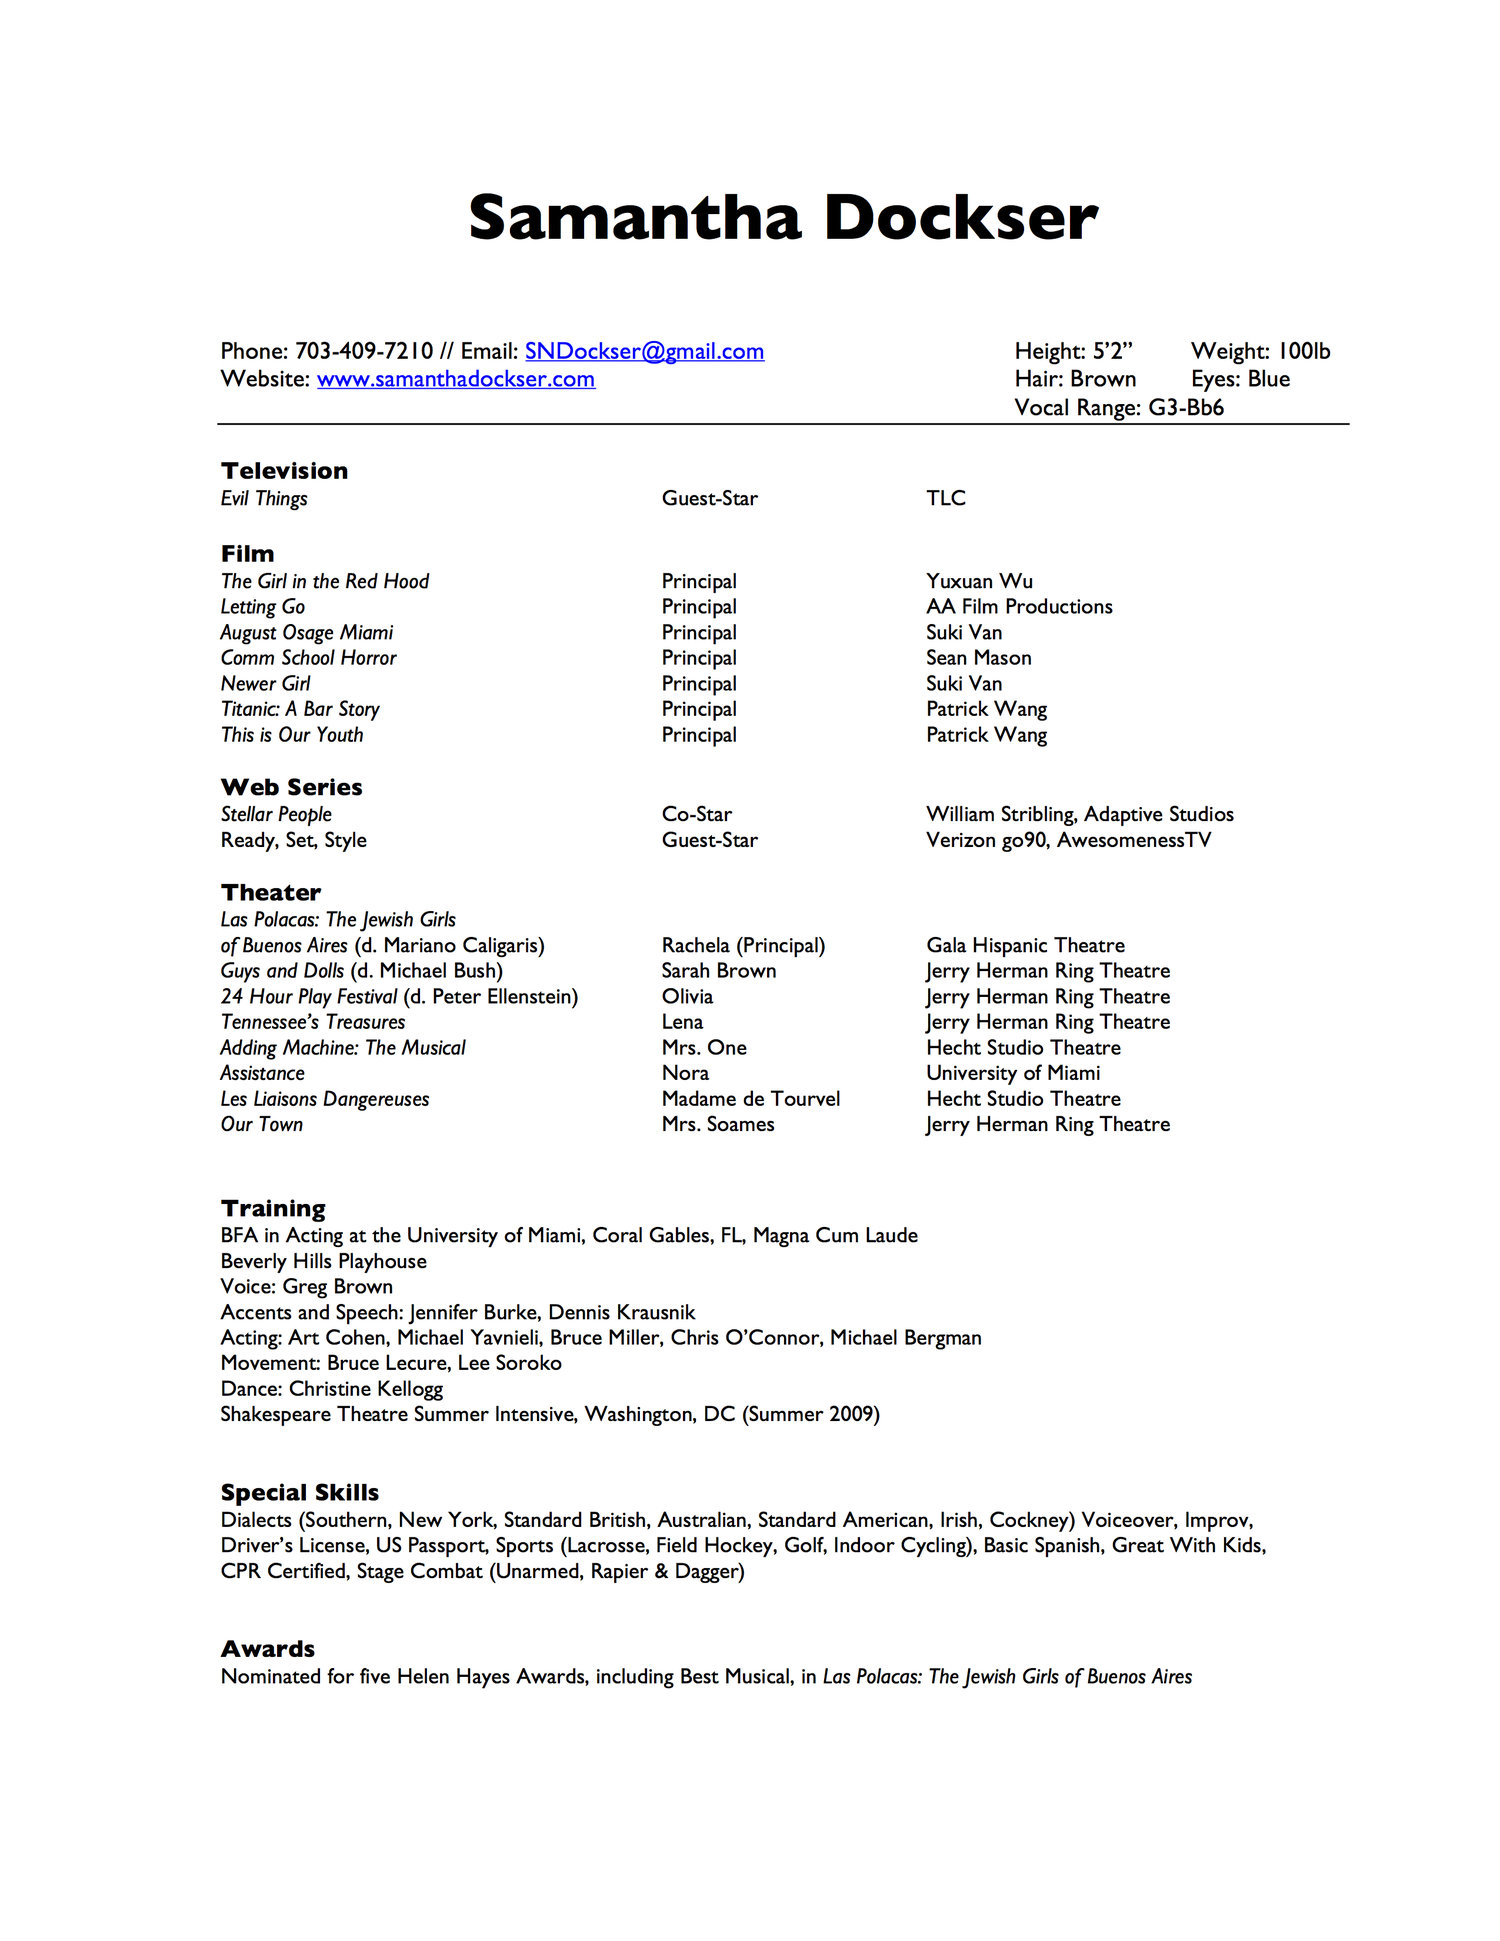 theatrical resume samantha dockser